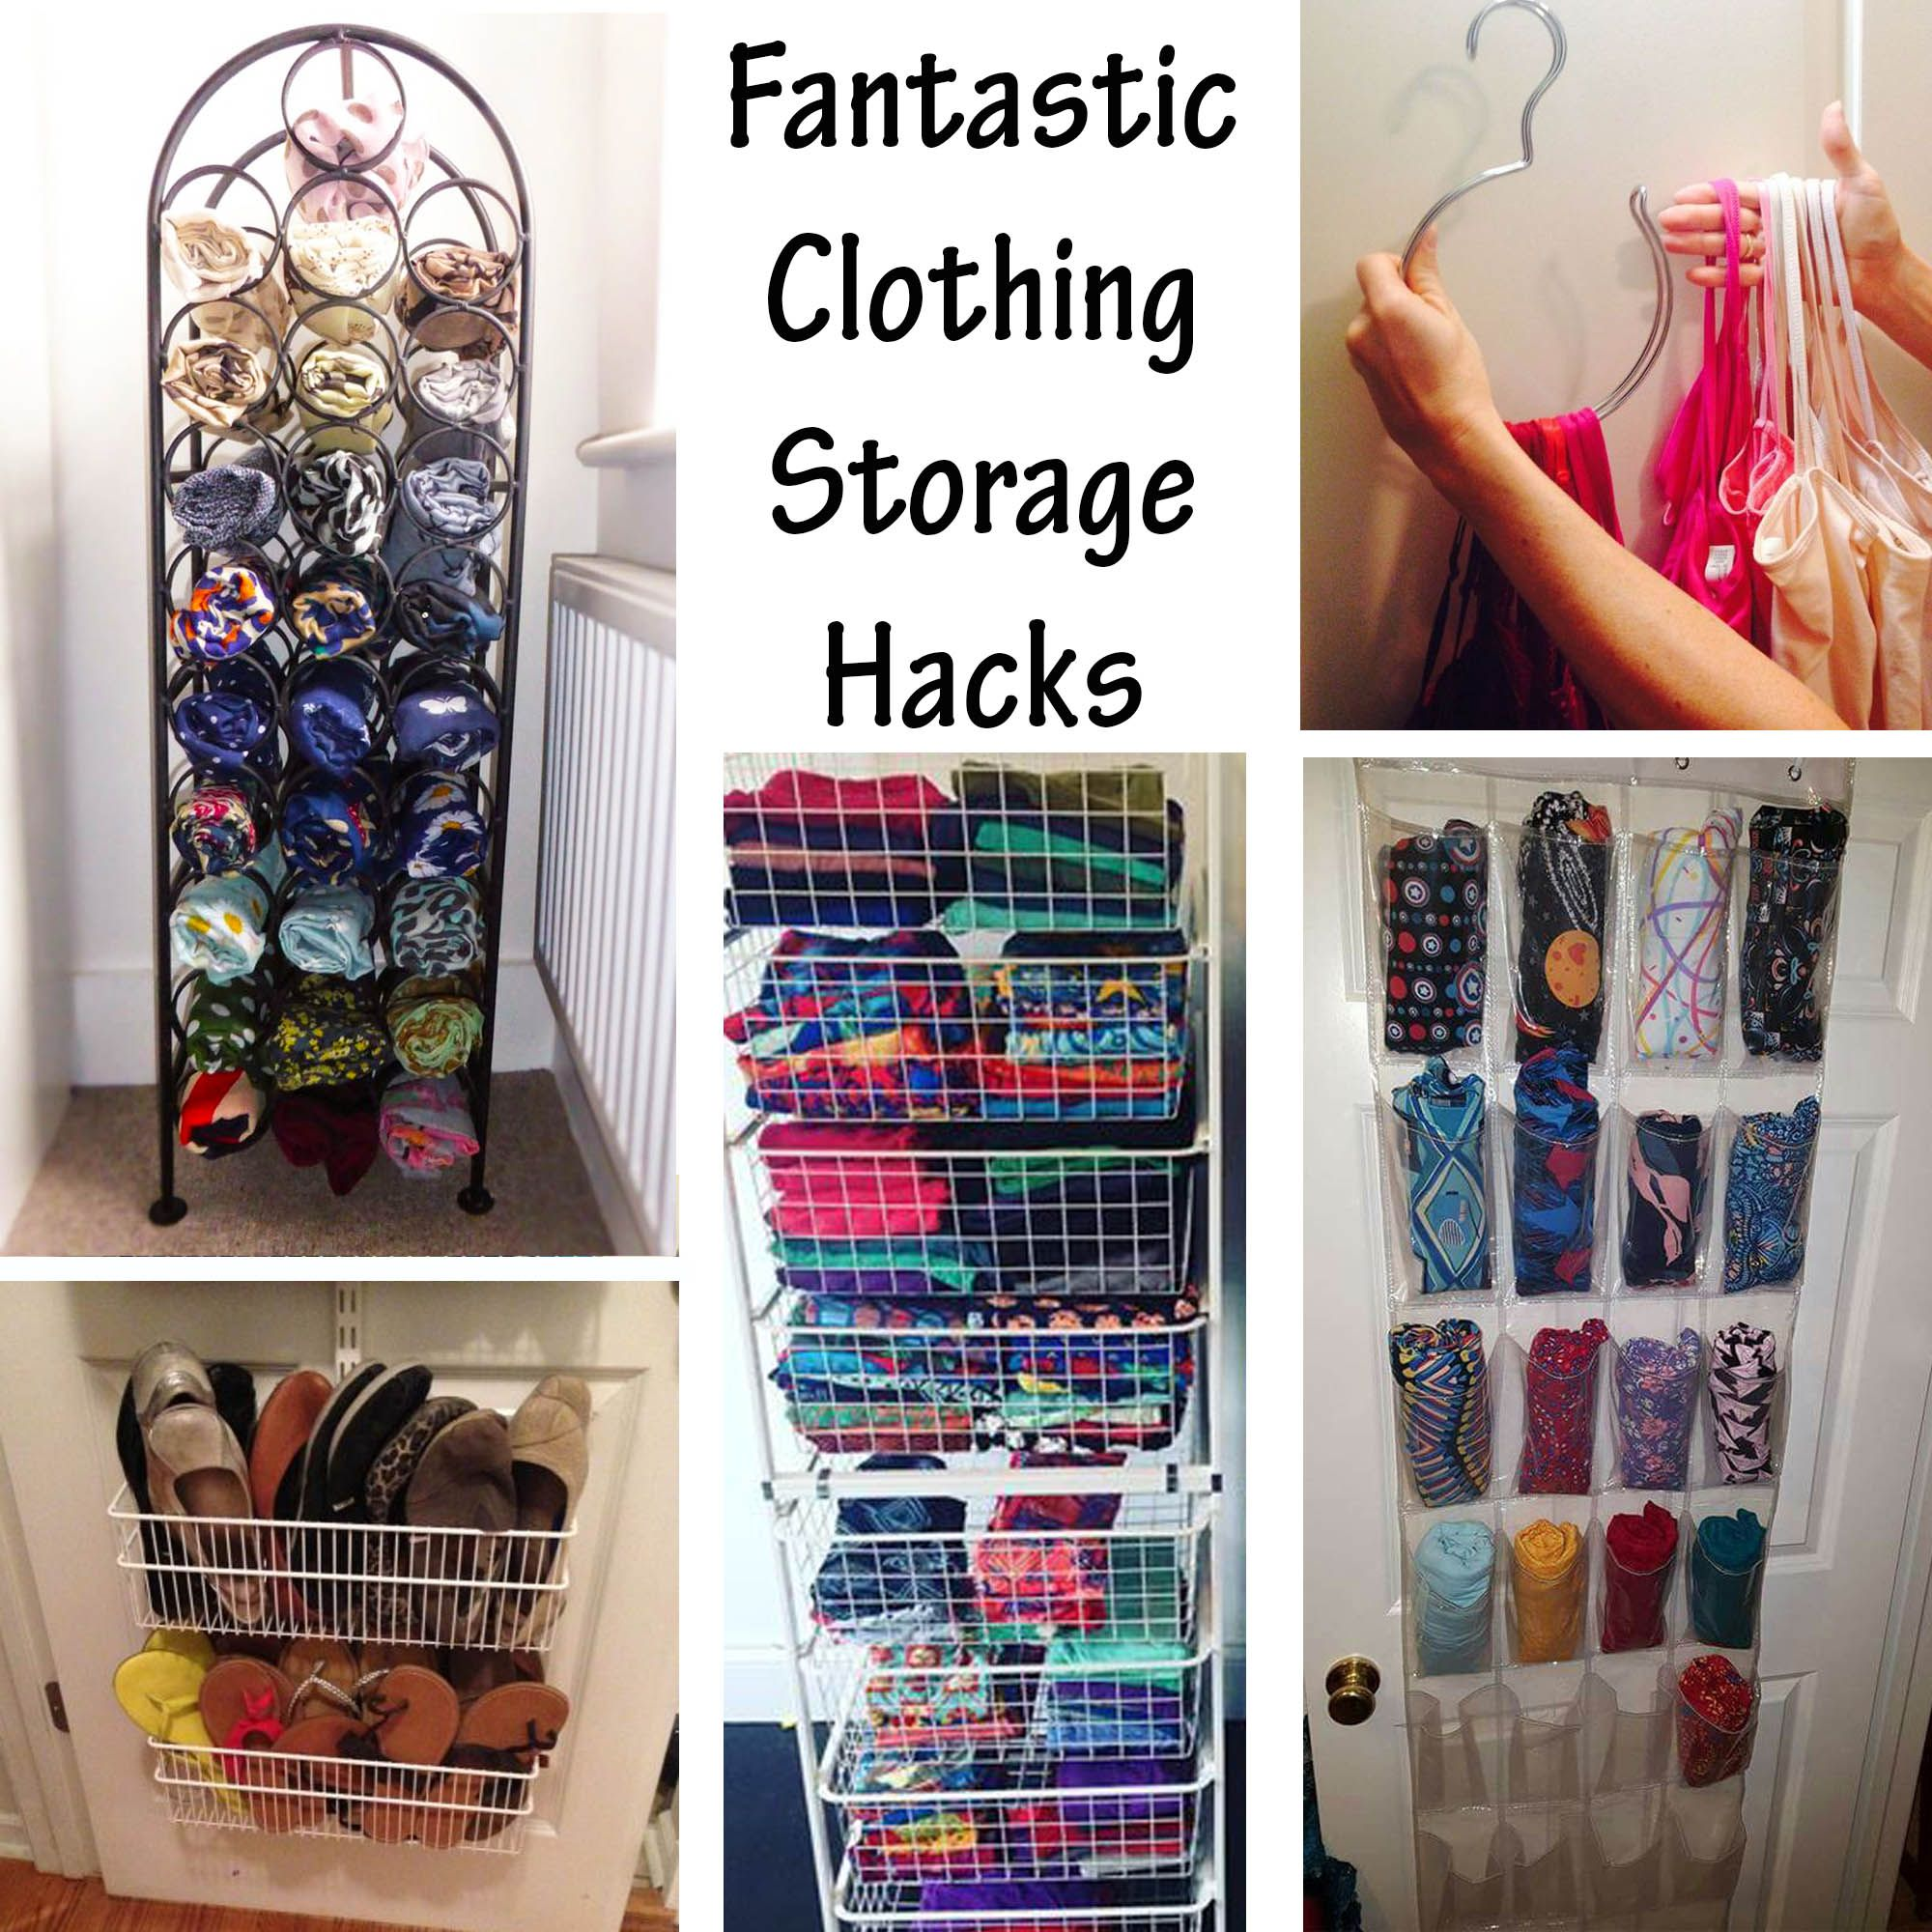 FANTASTIC CLOTHING STORAGE HACKS